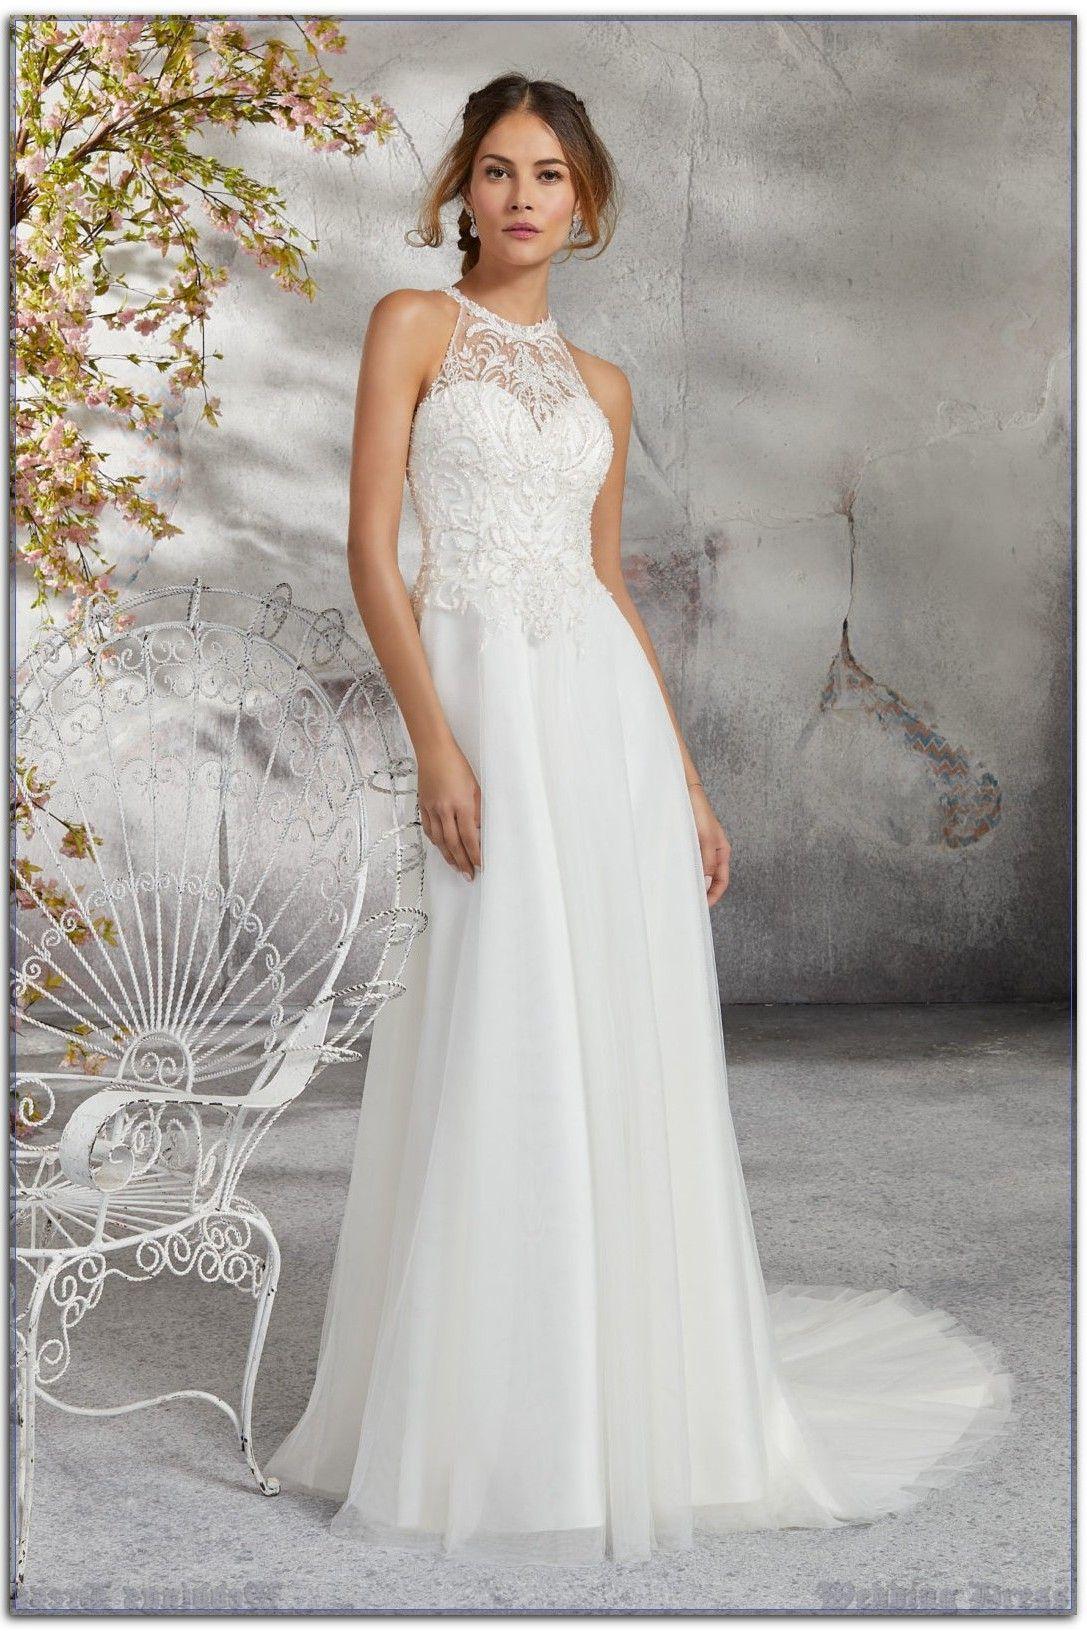 Should Fixing Weddings Dress Take 60 Steps?